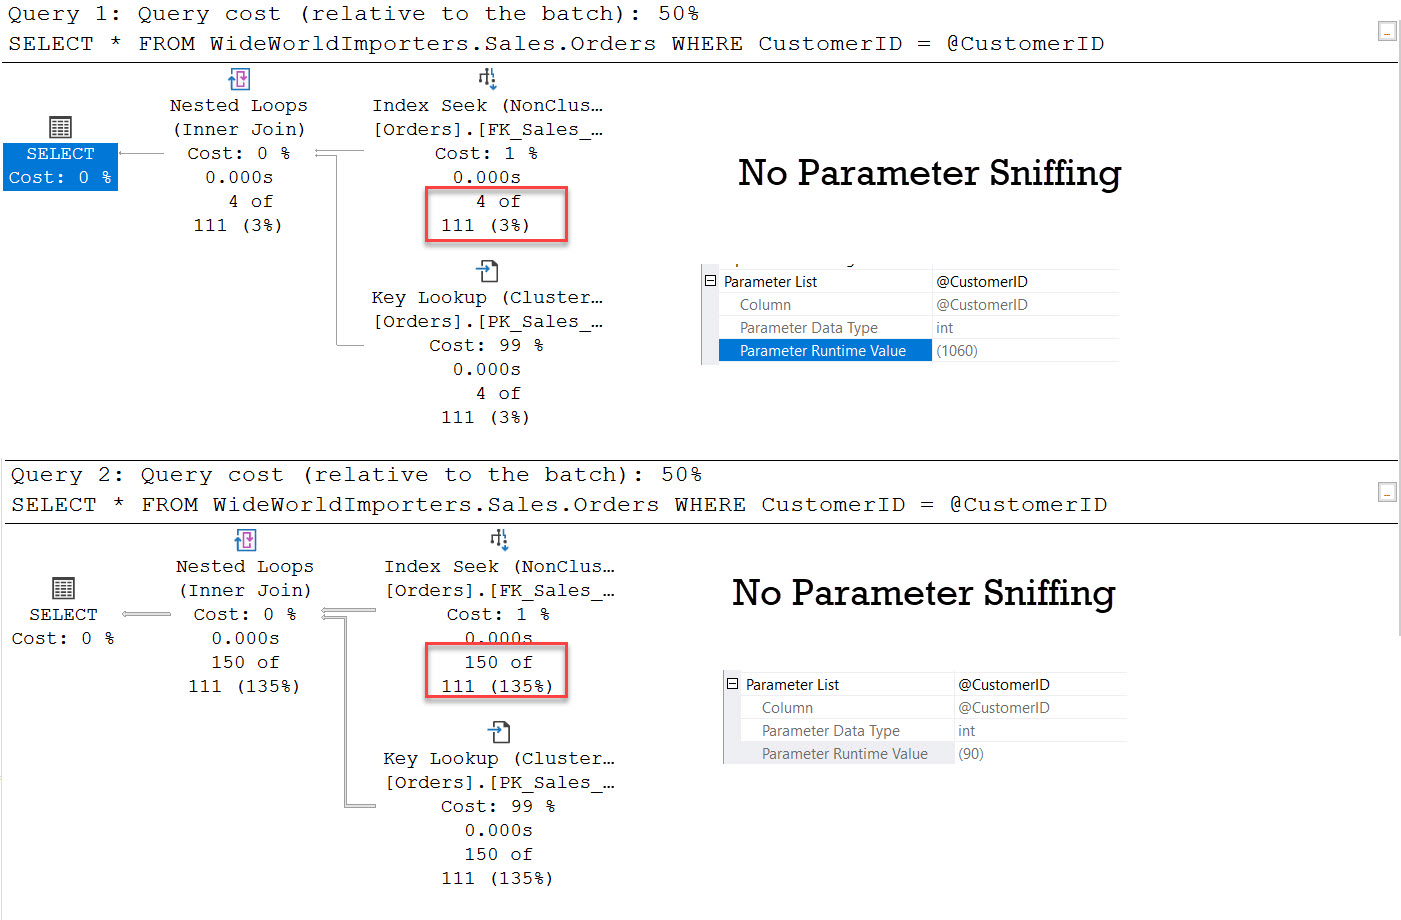 SQL SERVER - DATABASE SCOPED CONFIGURATION - PARAMETER SNIFFING scopedconfiguration